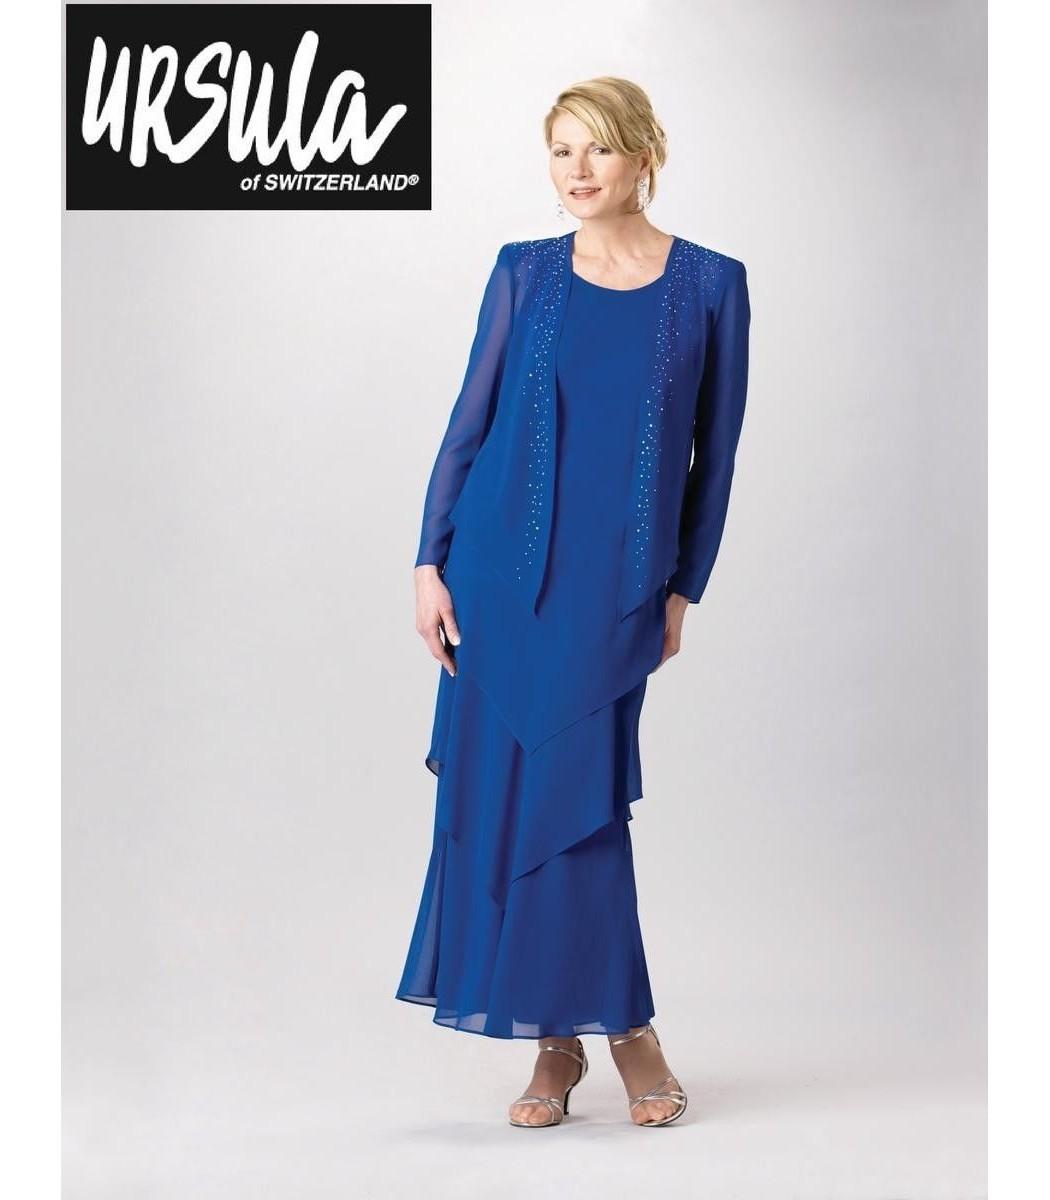 Ursula 62509 Cobalt Blue Evening Gown Dress Plus Sz 18 NEW Formal ...